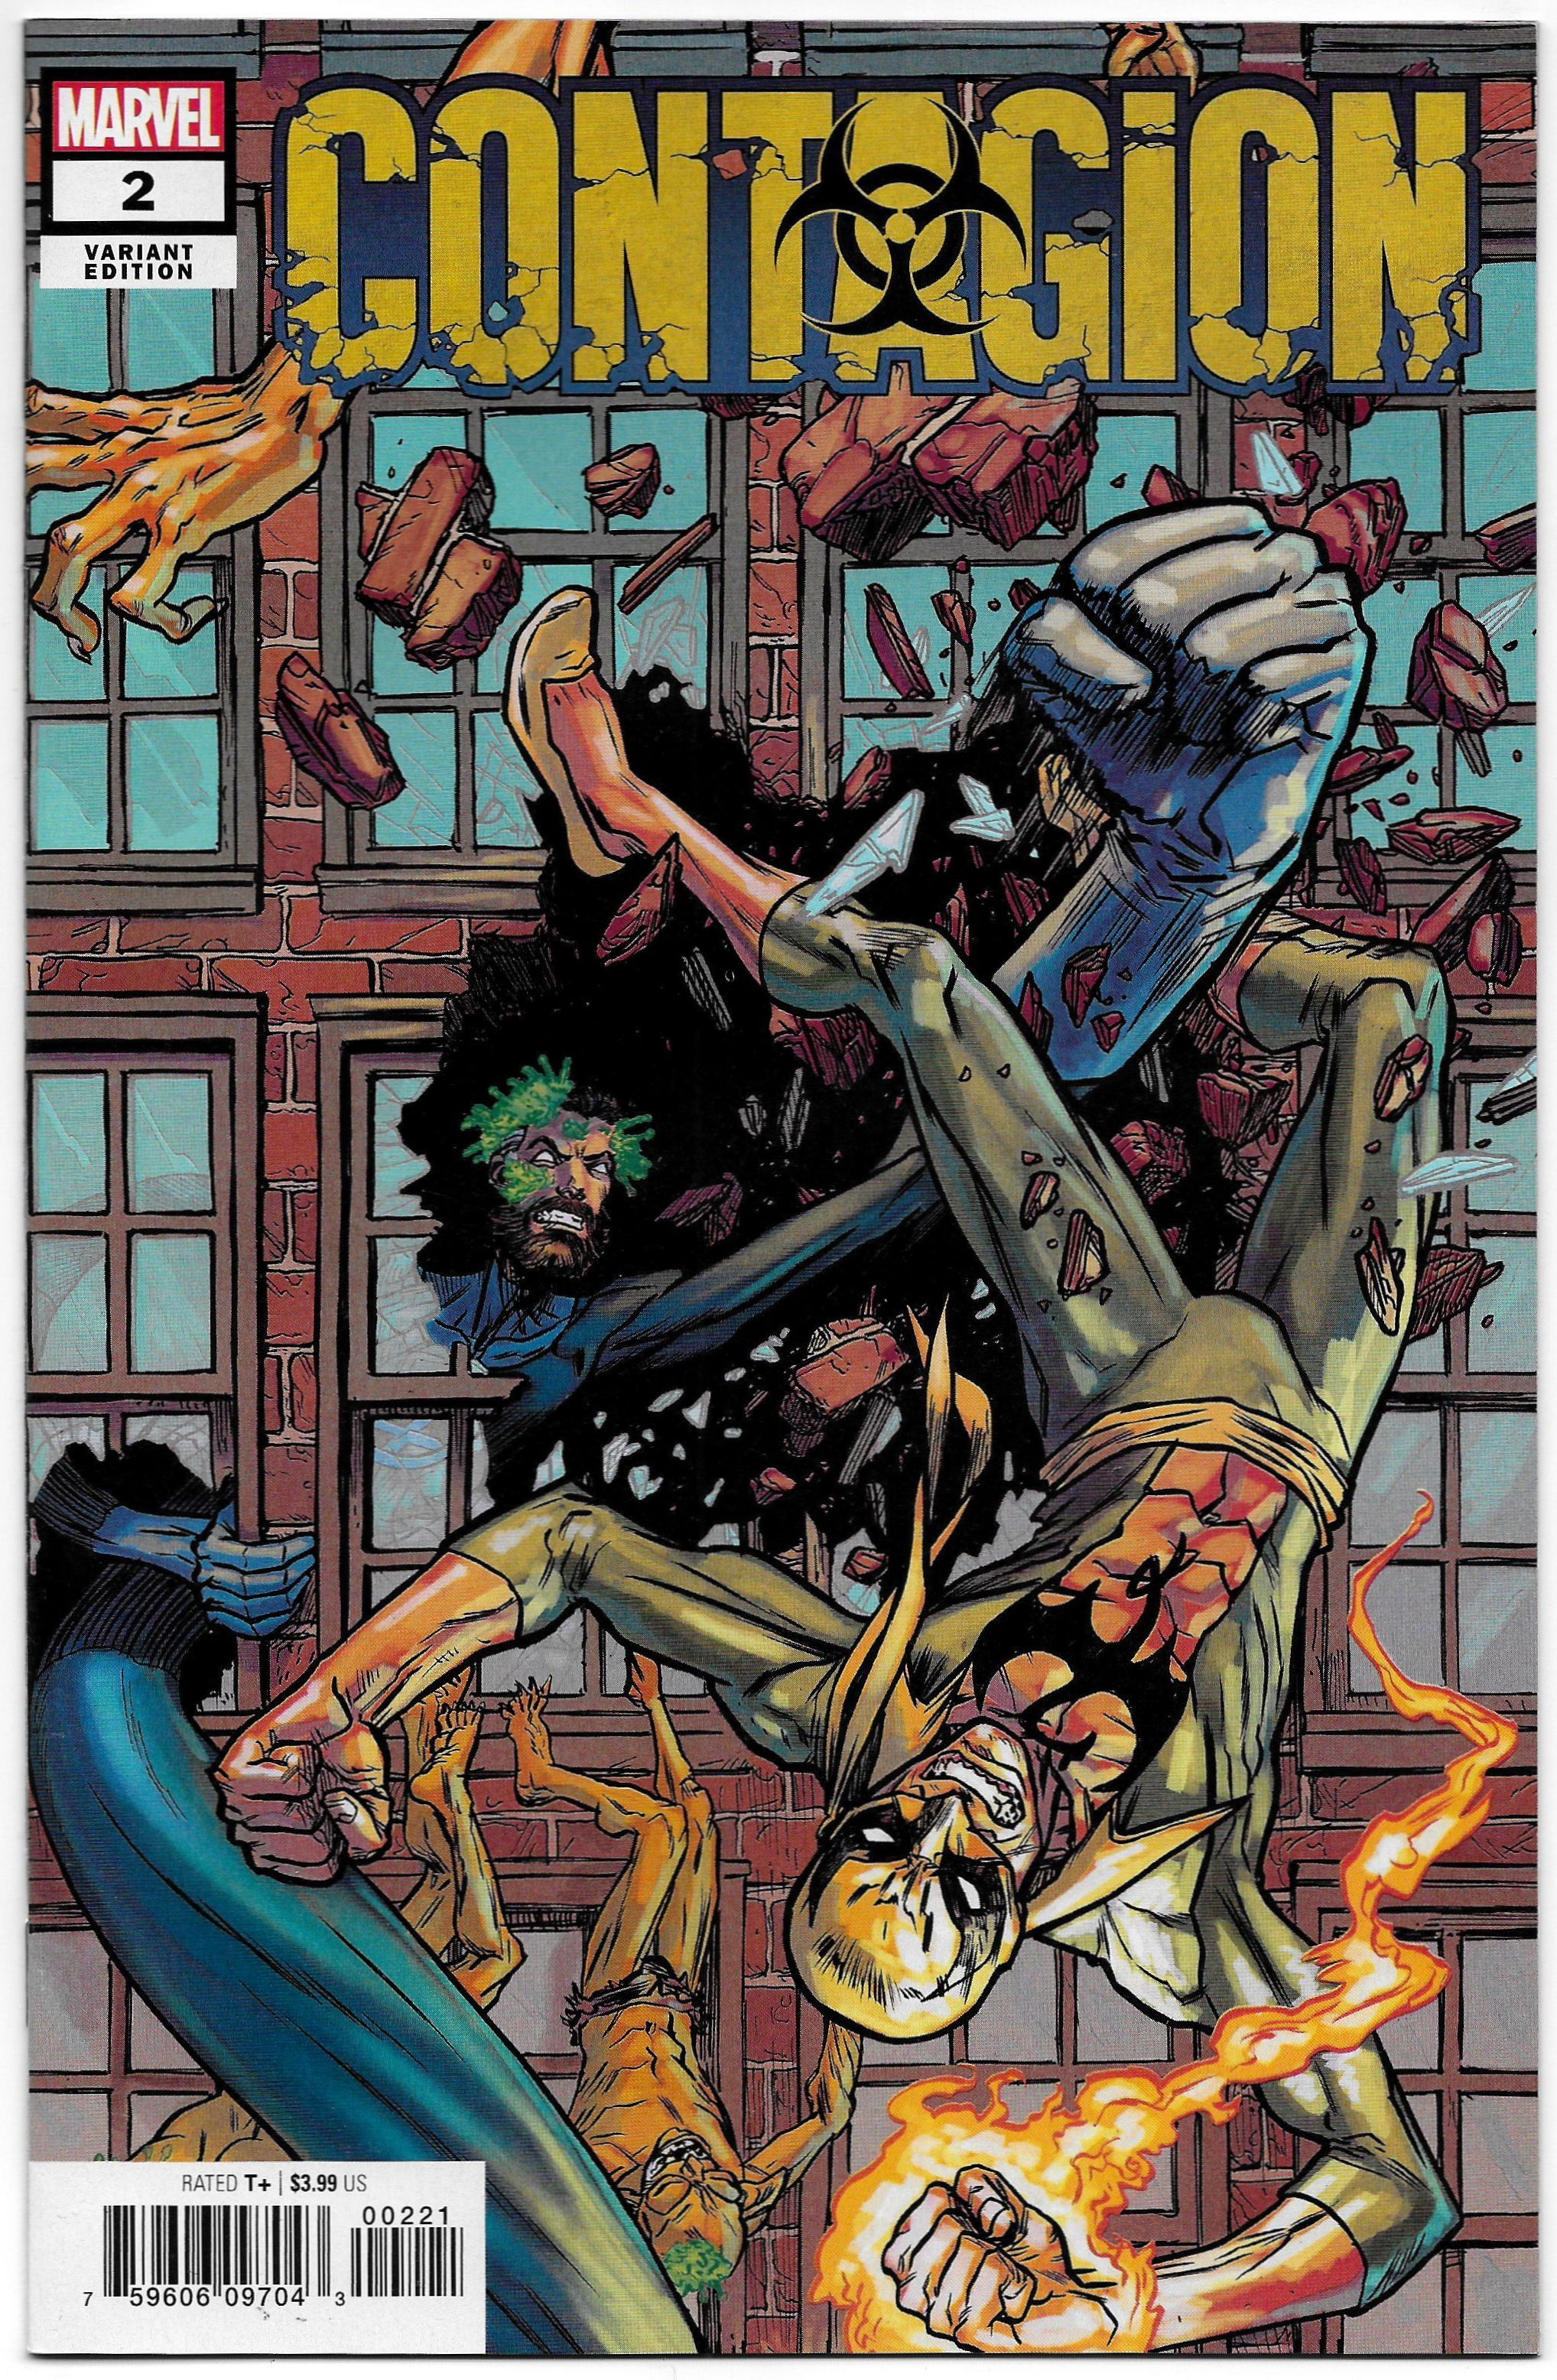 Superhero Marvel Comics Contagion 1 Ryan Browne